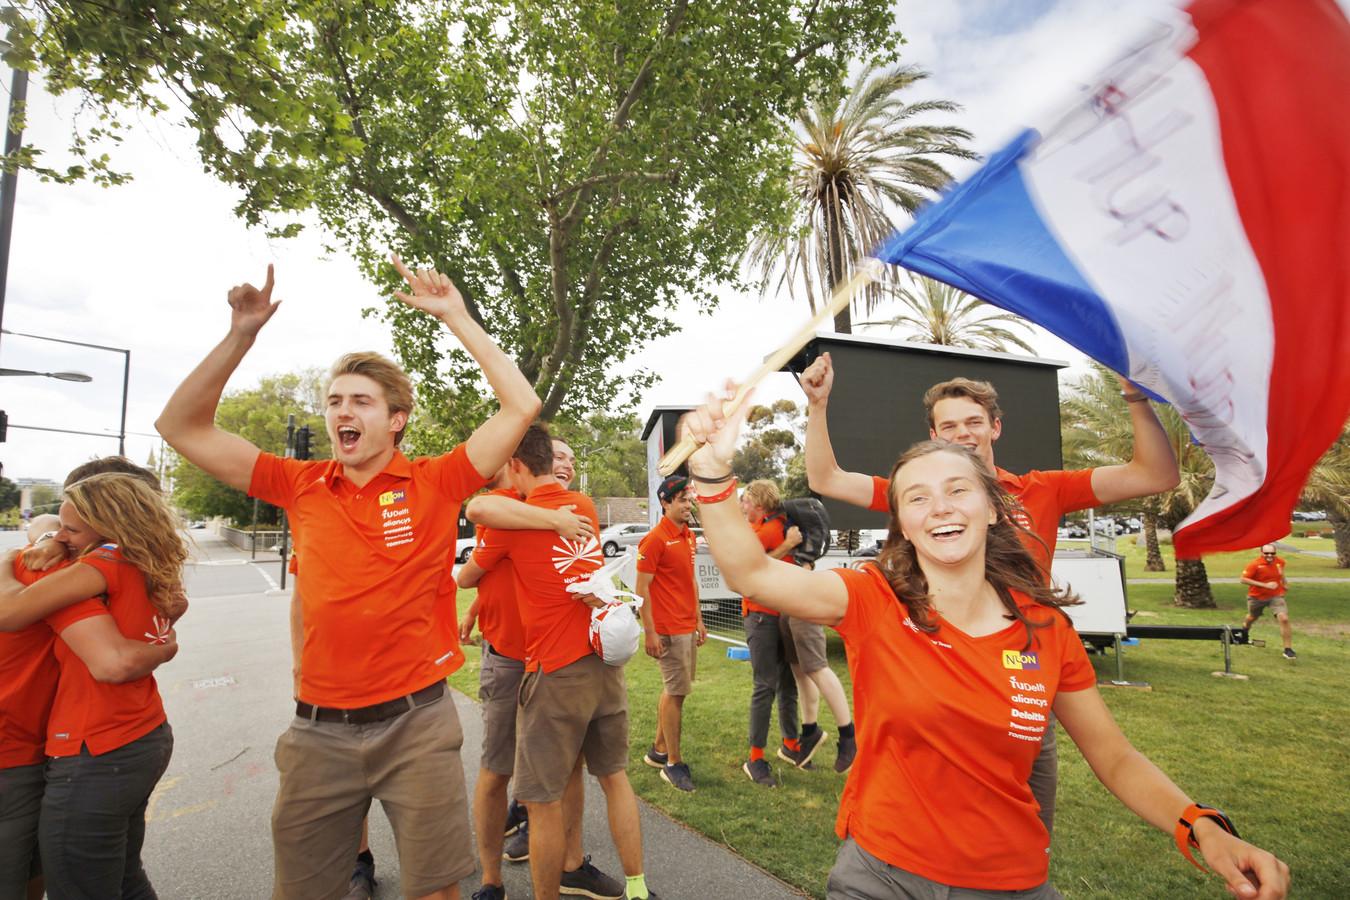 Nuon Solar Team juicht bij overwinning (Foto: Jorrit Lousberg).